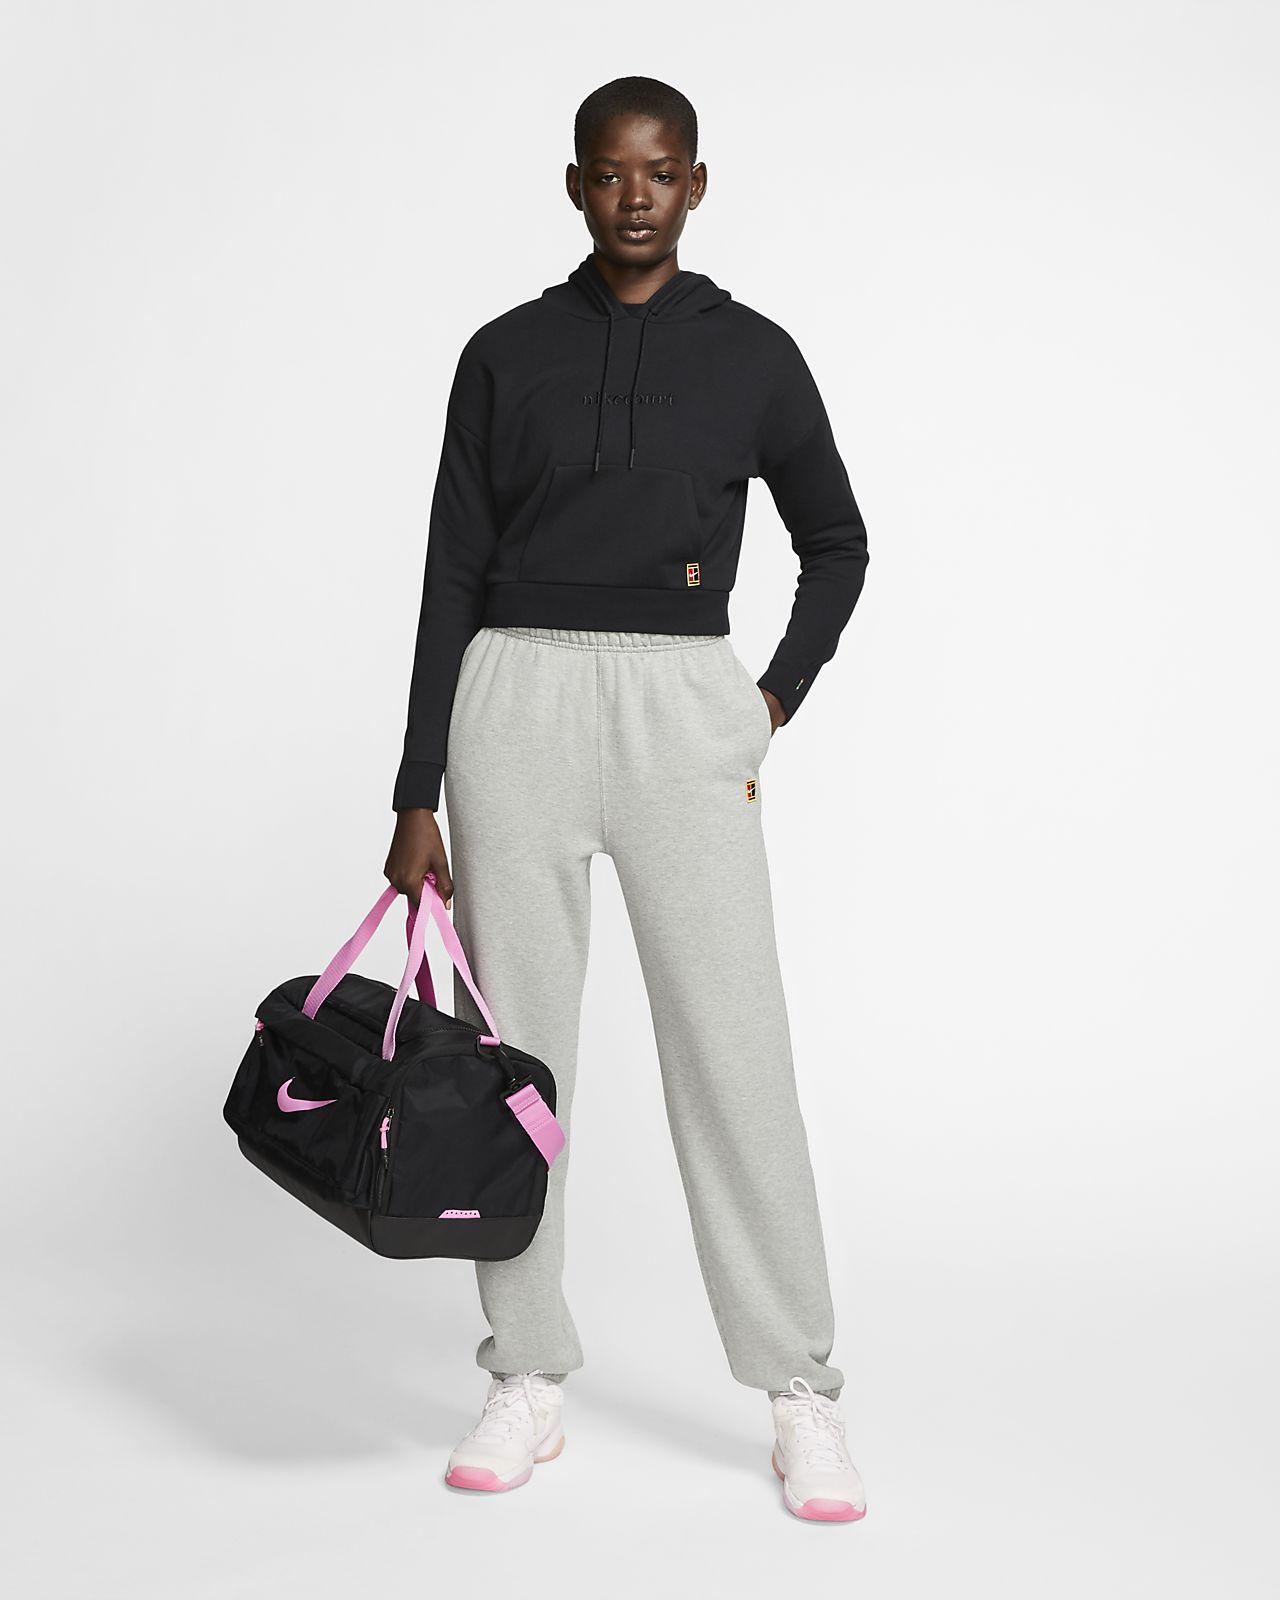 pantalon nike tennis femme